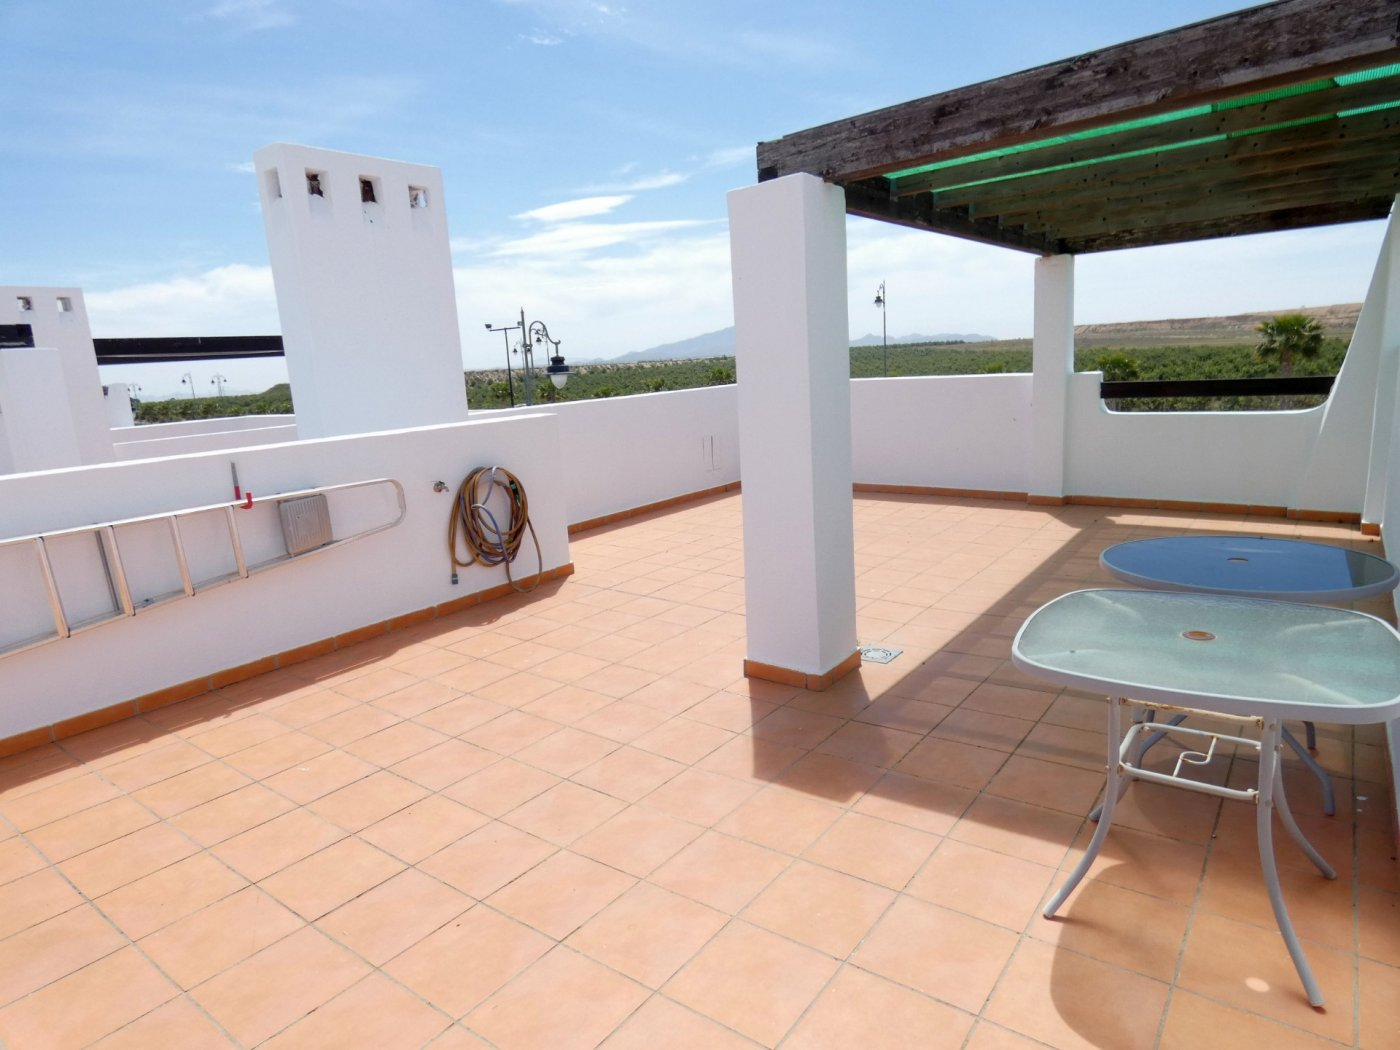 Gallery Image 27 of Key-Ready 2 Bedroom Apartment Overlooking the Citrus Groves in Jardin 10, Condado de Alhama